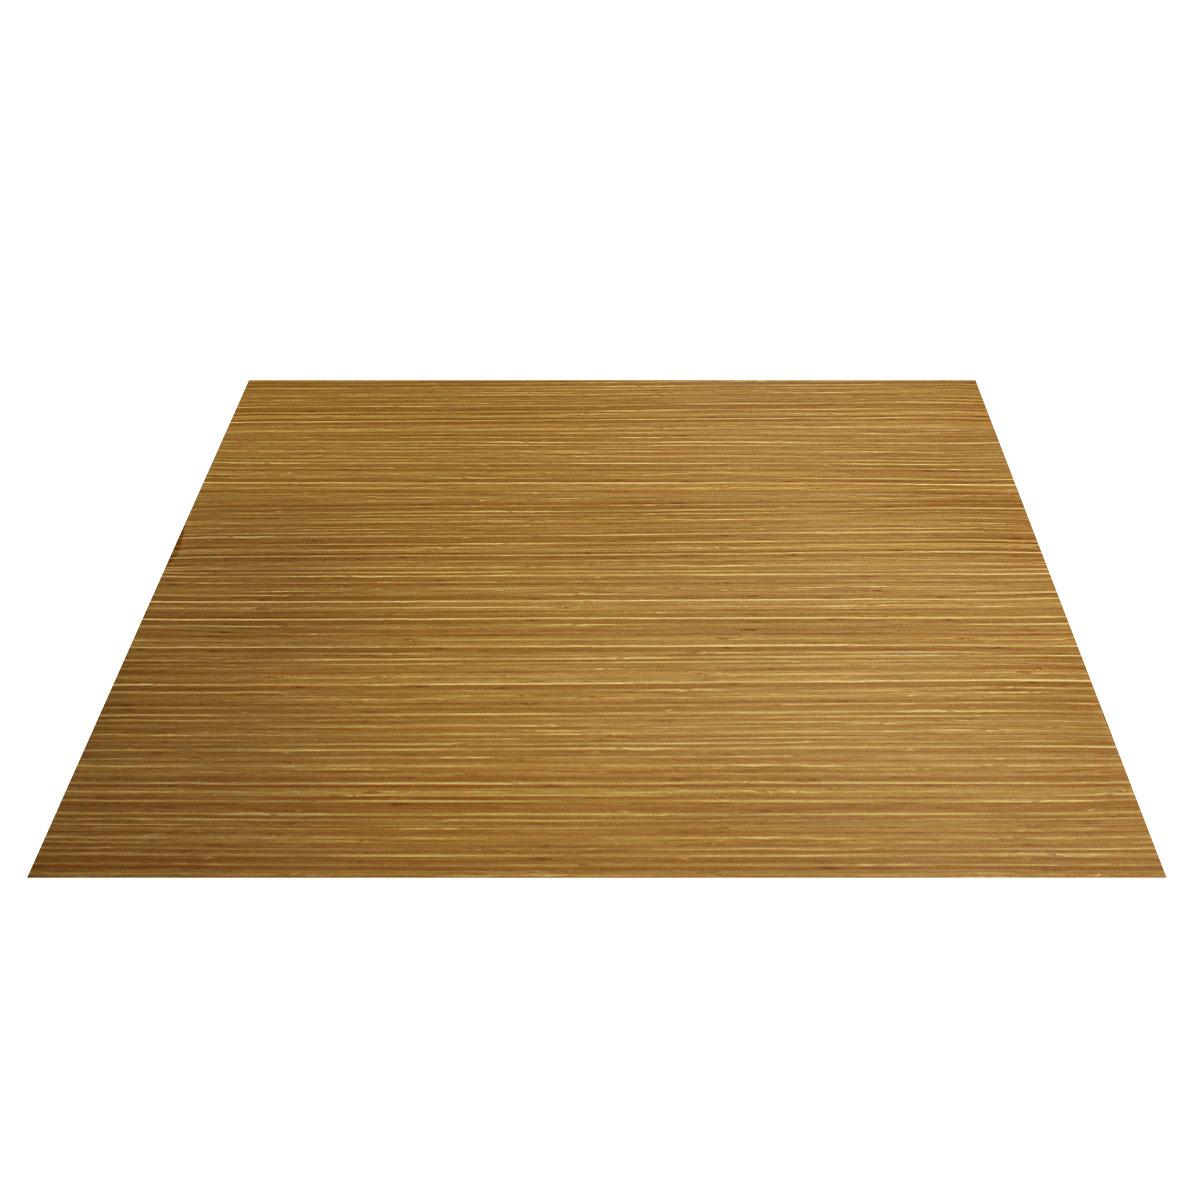 neuholz vinyl laminat selbstklebend bambus dielen. Black Bedroom Furniture Sets. Home Design Ideas